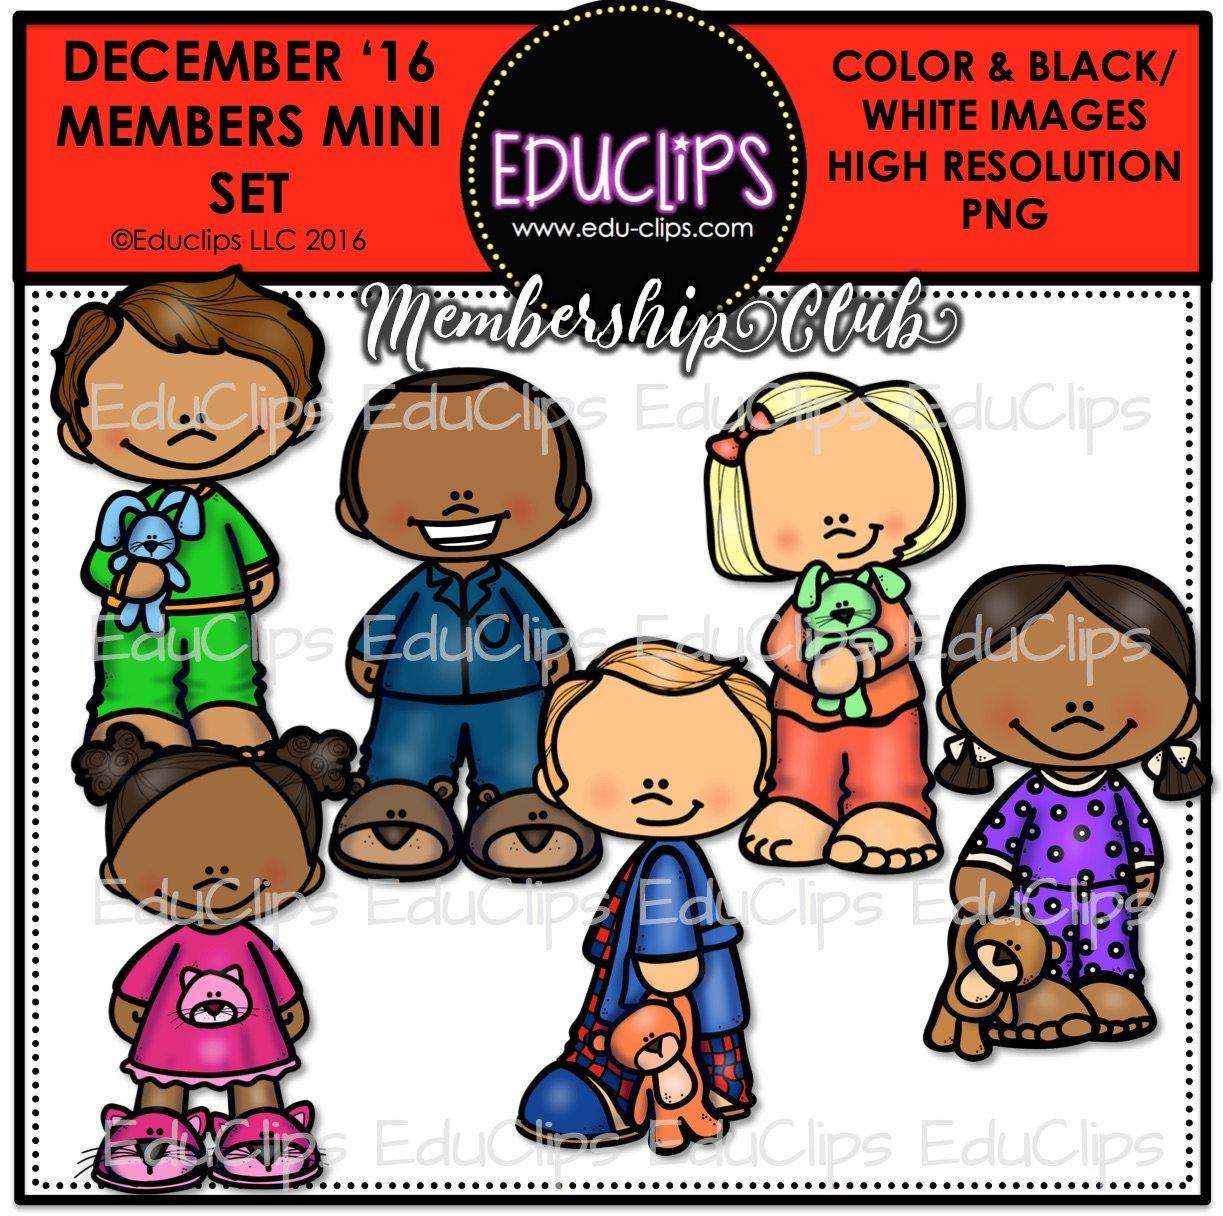 december-16-mini-set